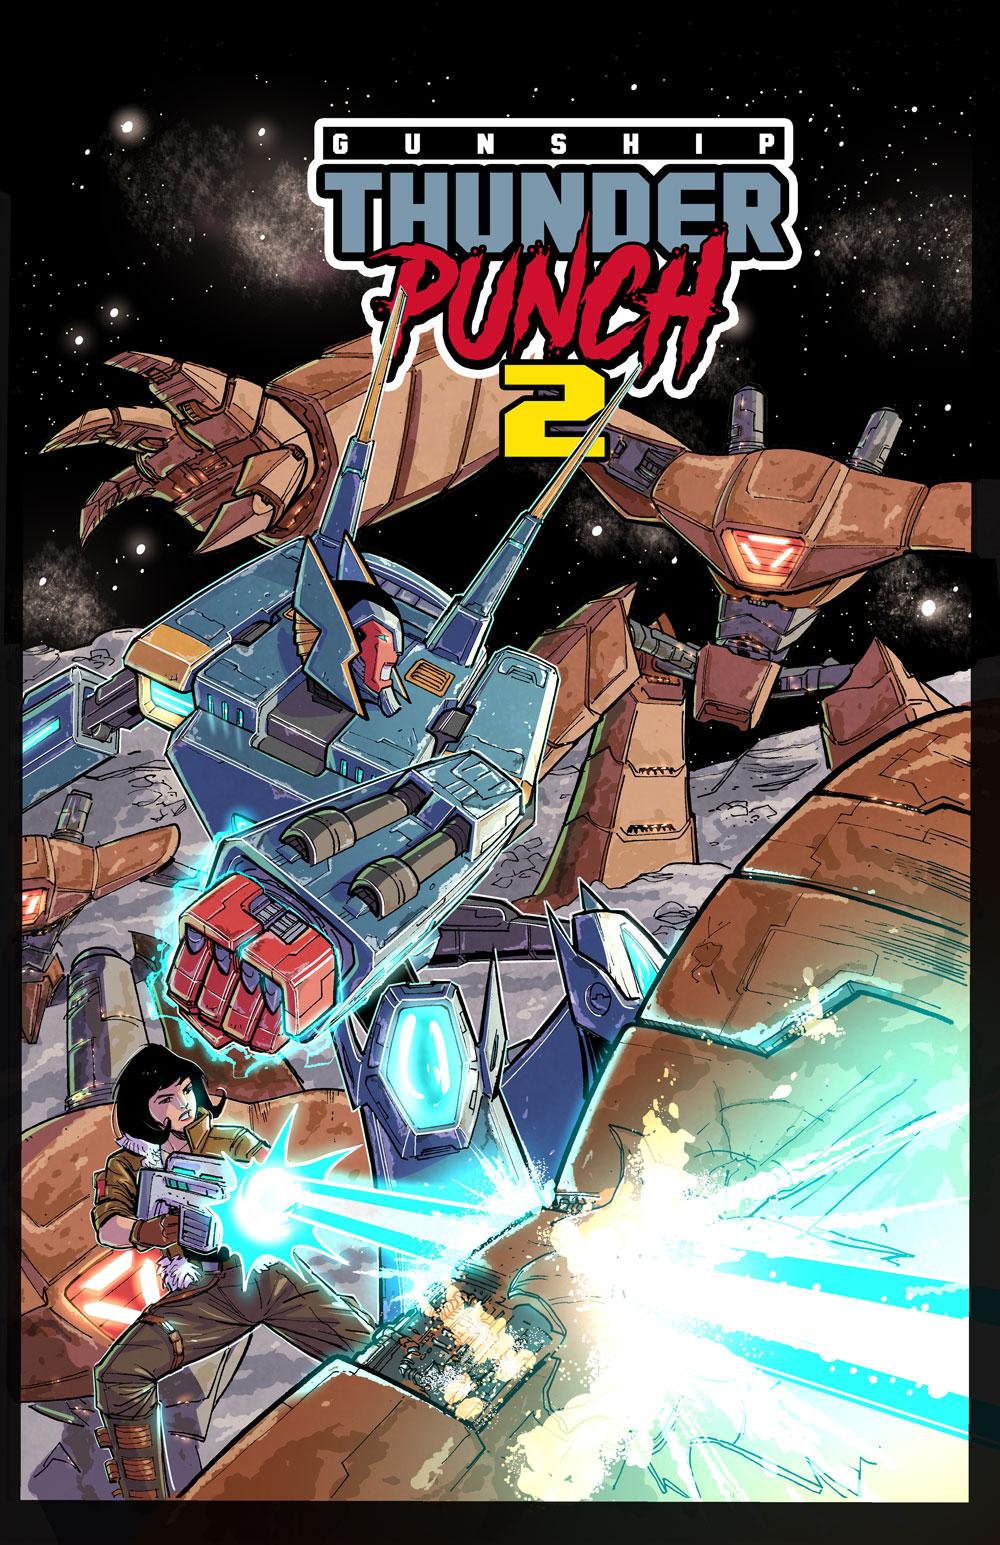 Gunship Thunderpunch Book 2 & Synthwave Album